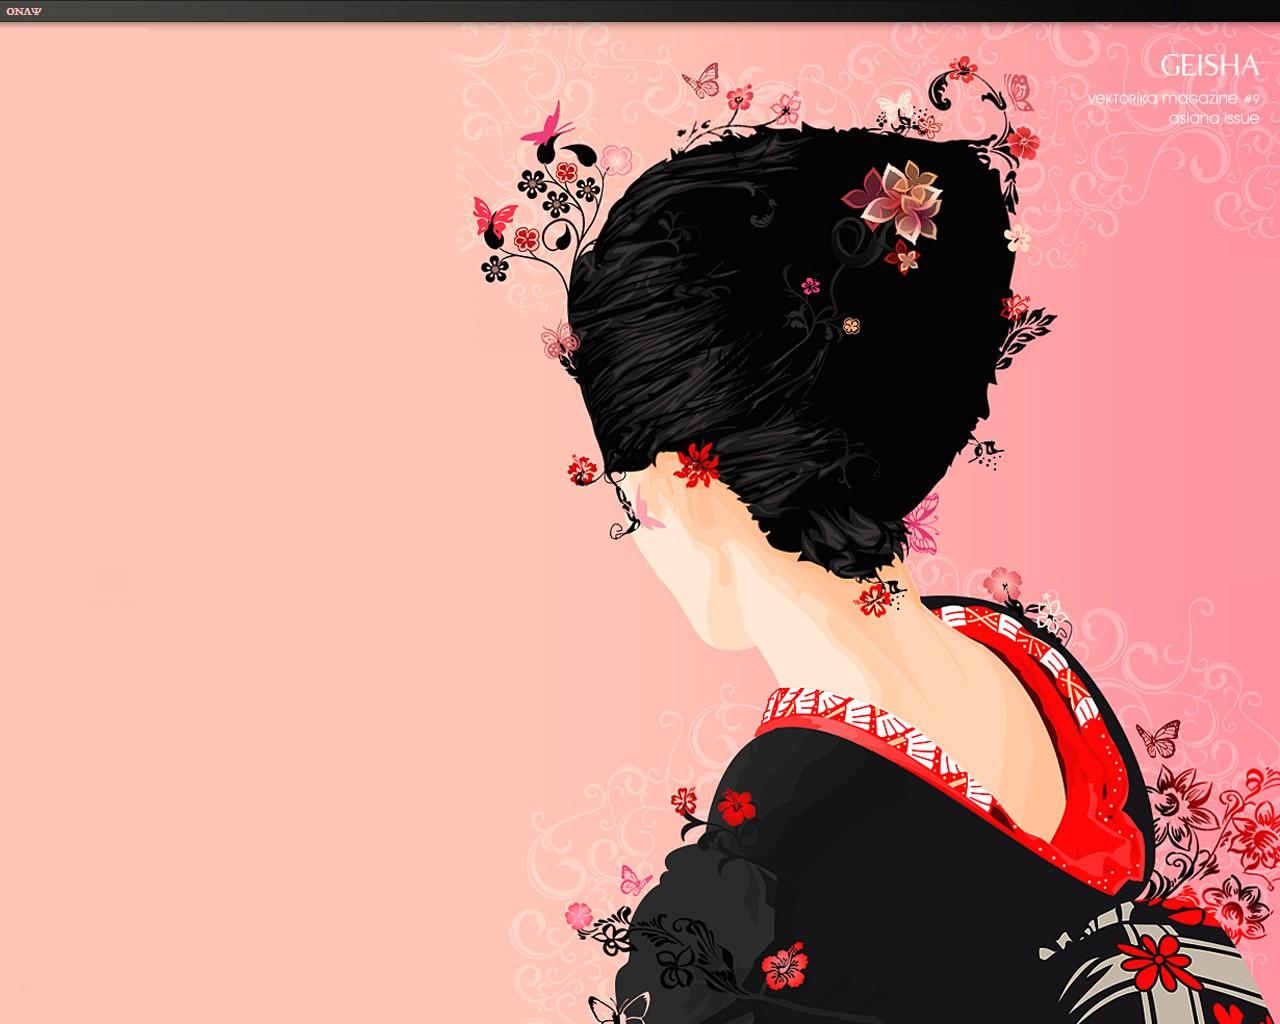 Download Japanese Geisha Wallpaper 1280x1024 Wallpoper 1280x1024